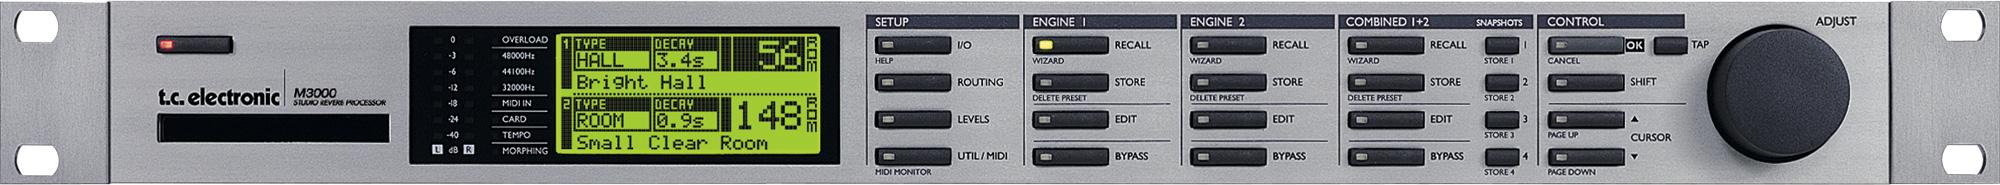 Tc electronic M3000JP